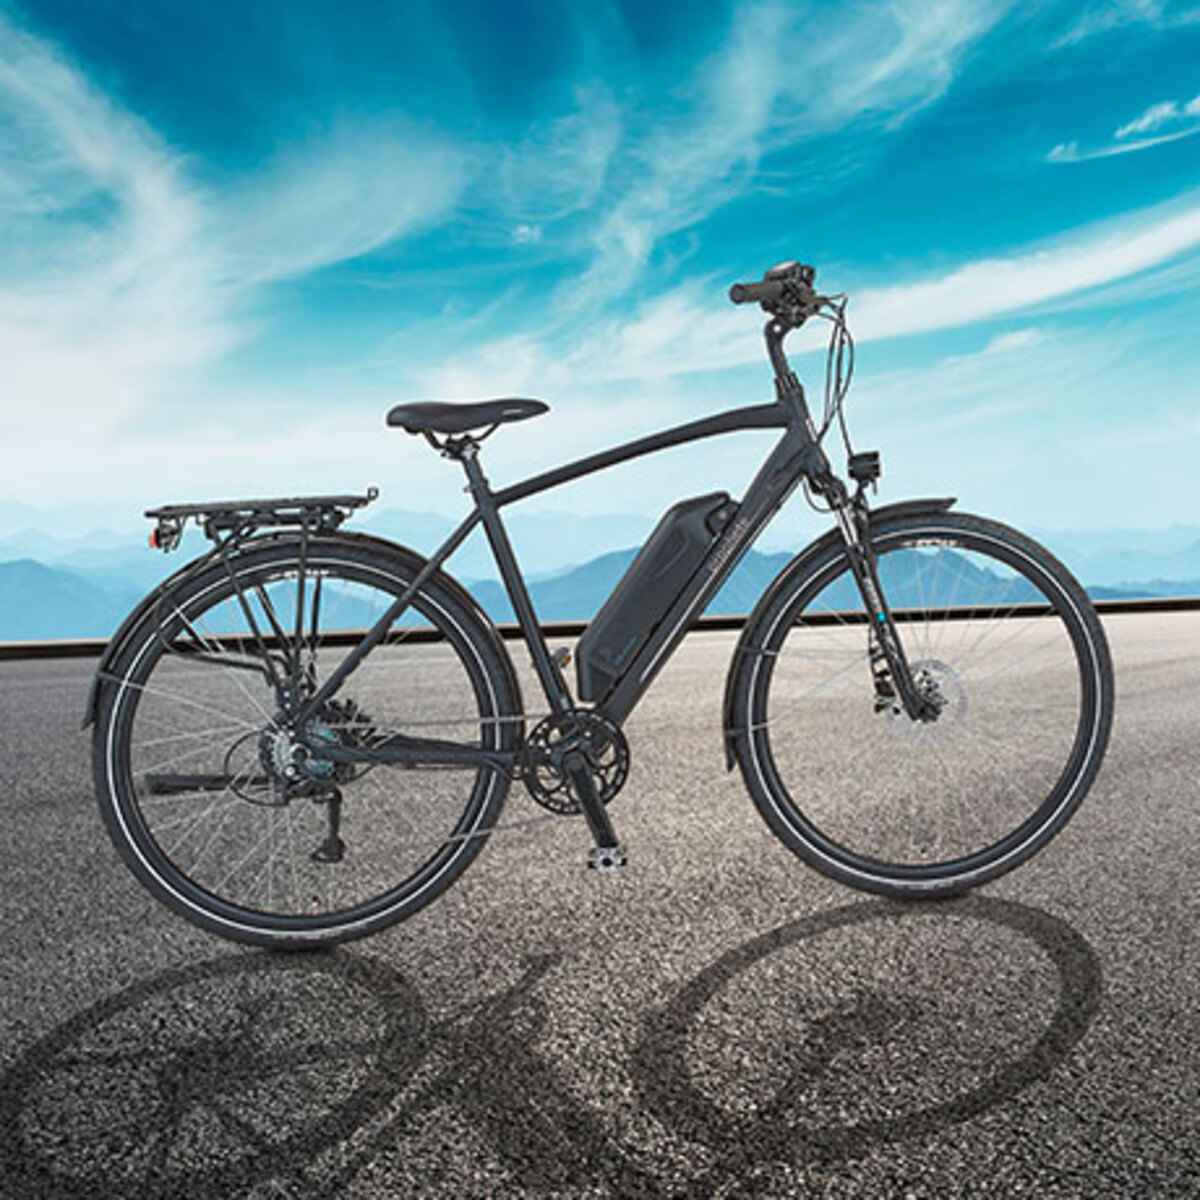 Bild 1 von Trekking-E-Bike Herren1